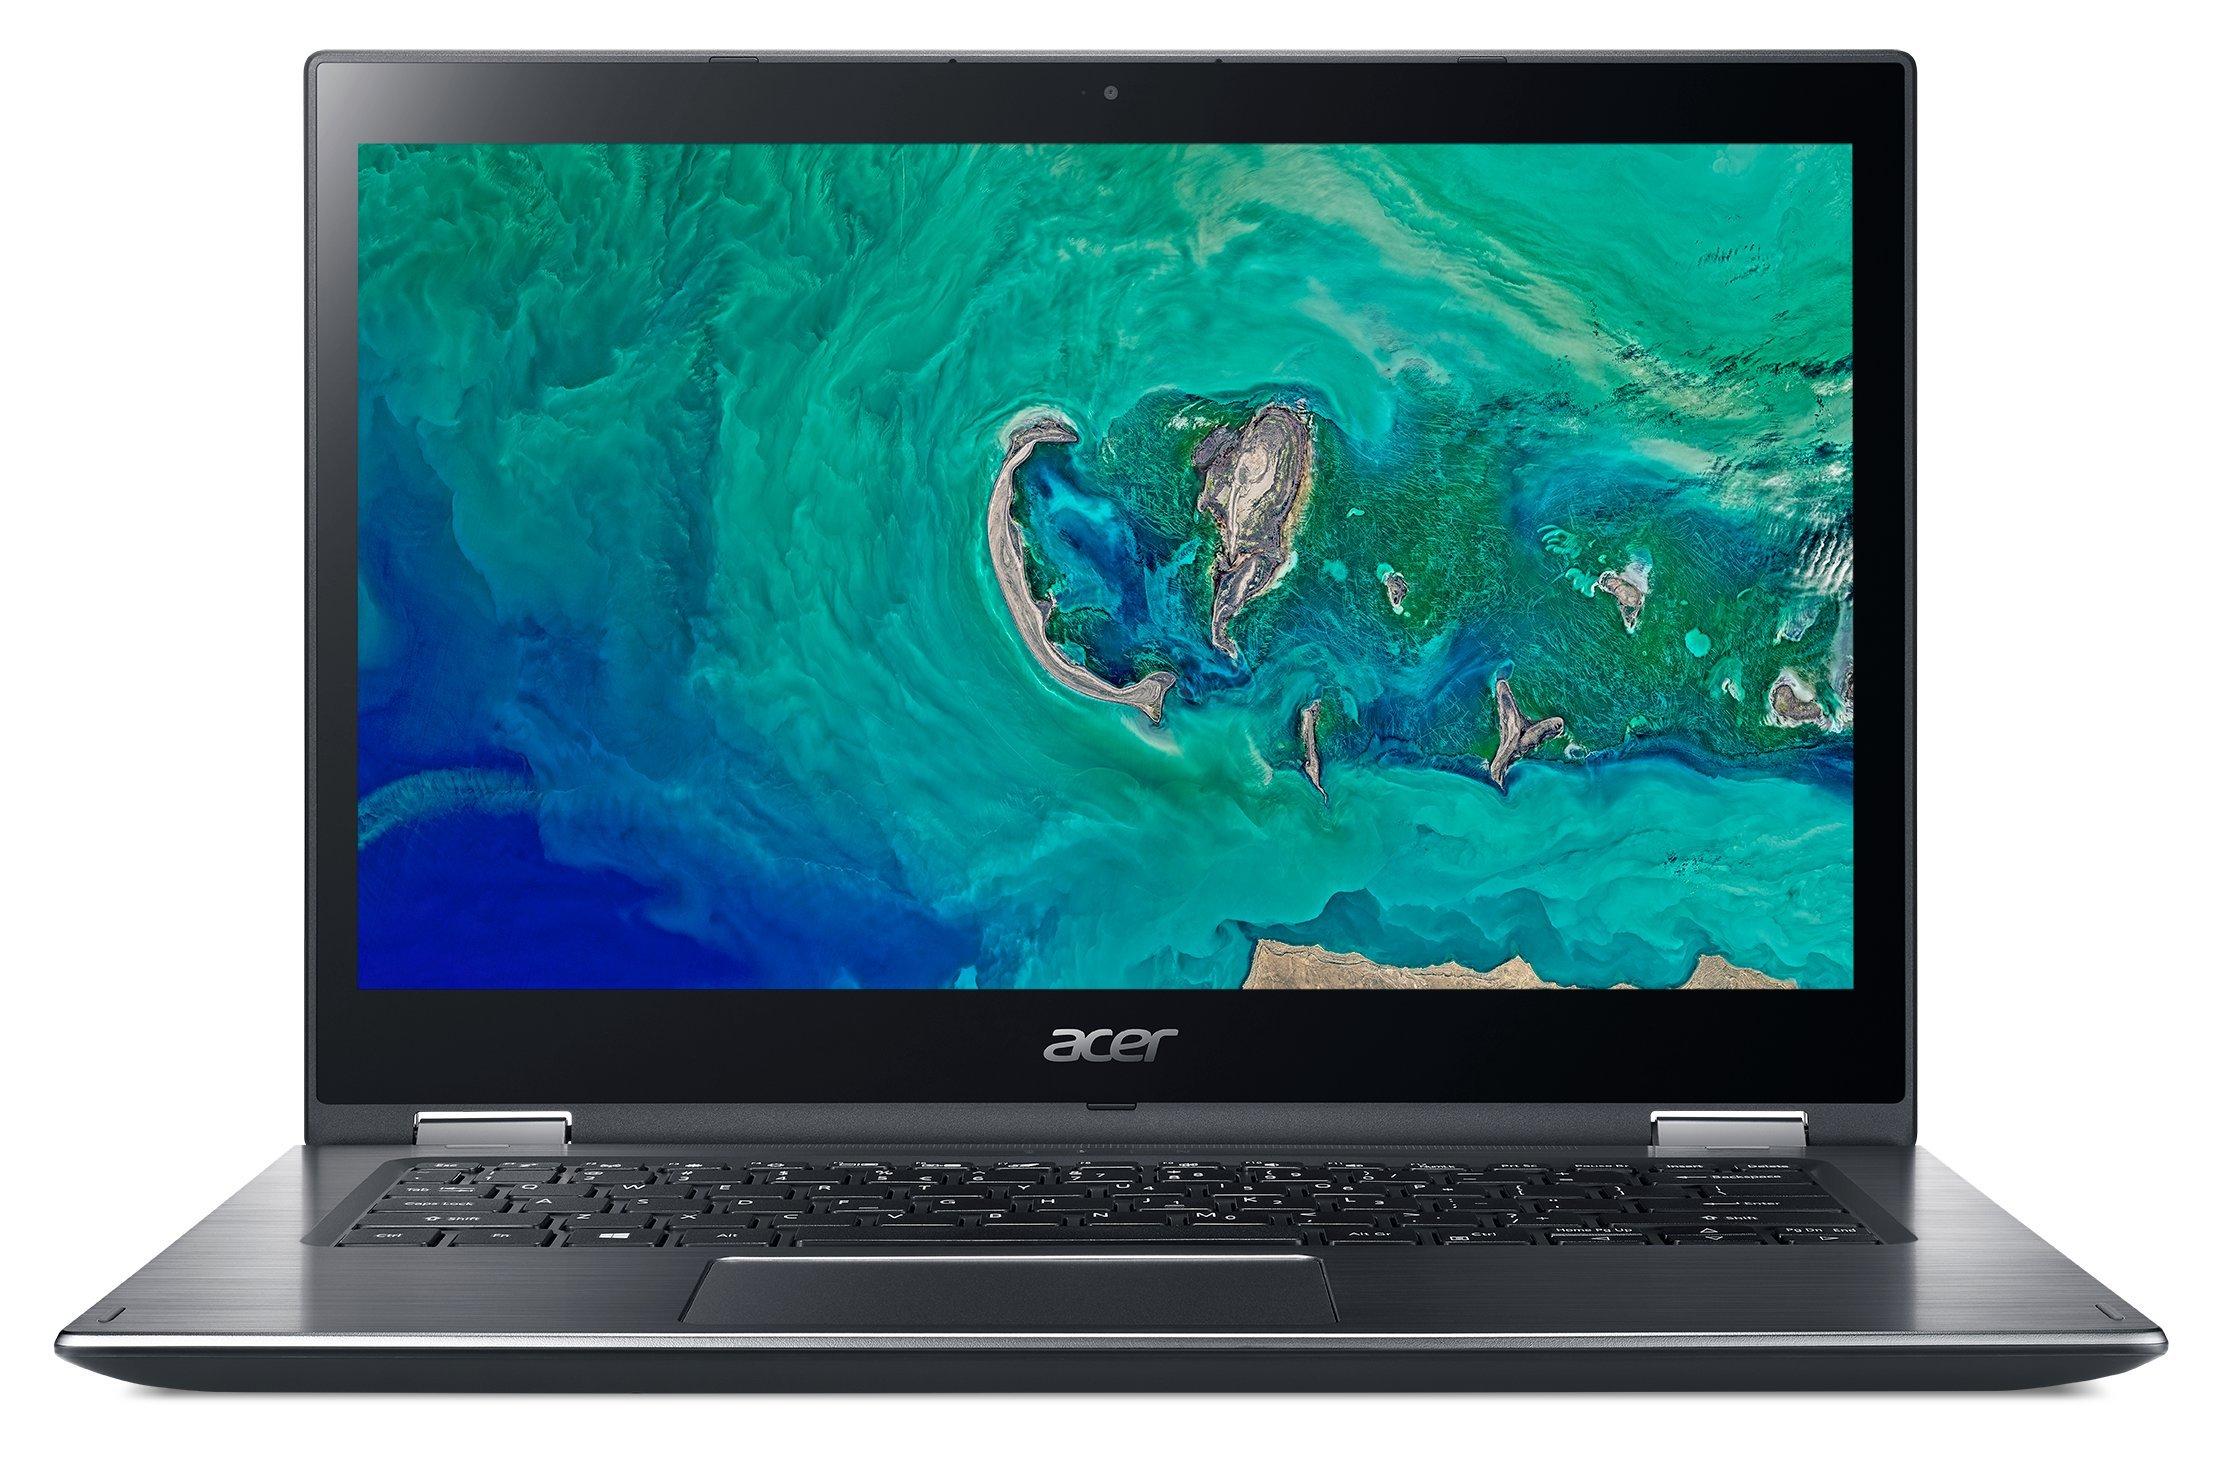 Acer Spin 3 SP314-51-52ZL – Ordenador portátil de 14″ Full HD (Intel Core i5-8250U, 4 GB RAM, 16 GB Intel Optane, 1000 GB HDD, UMA, Windows 10 Home) Gris- Teclado QWERTY Español